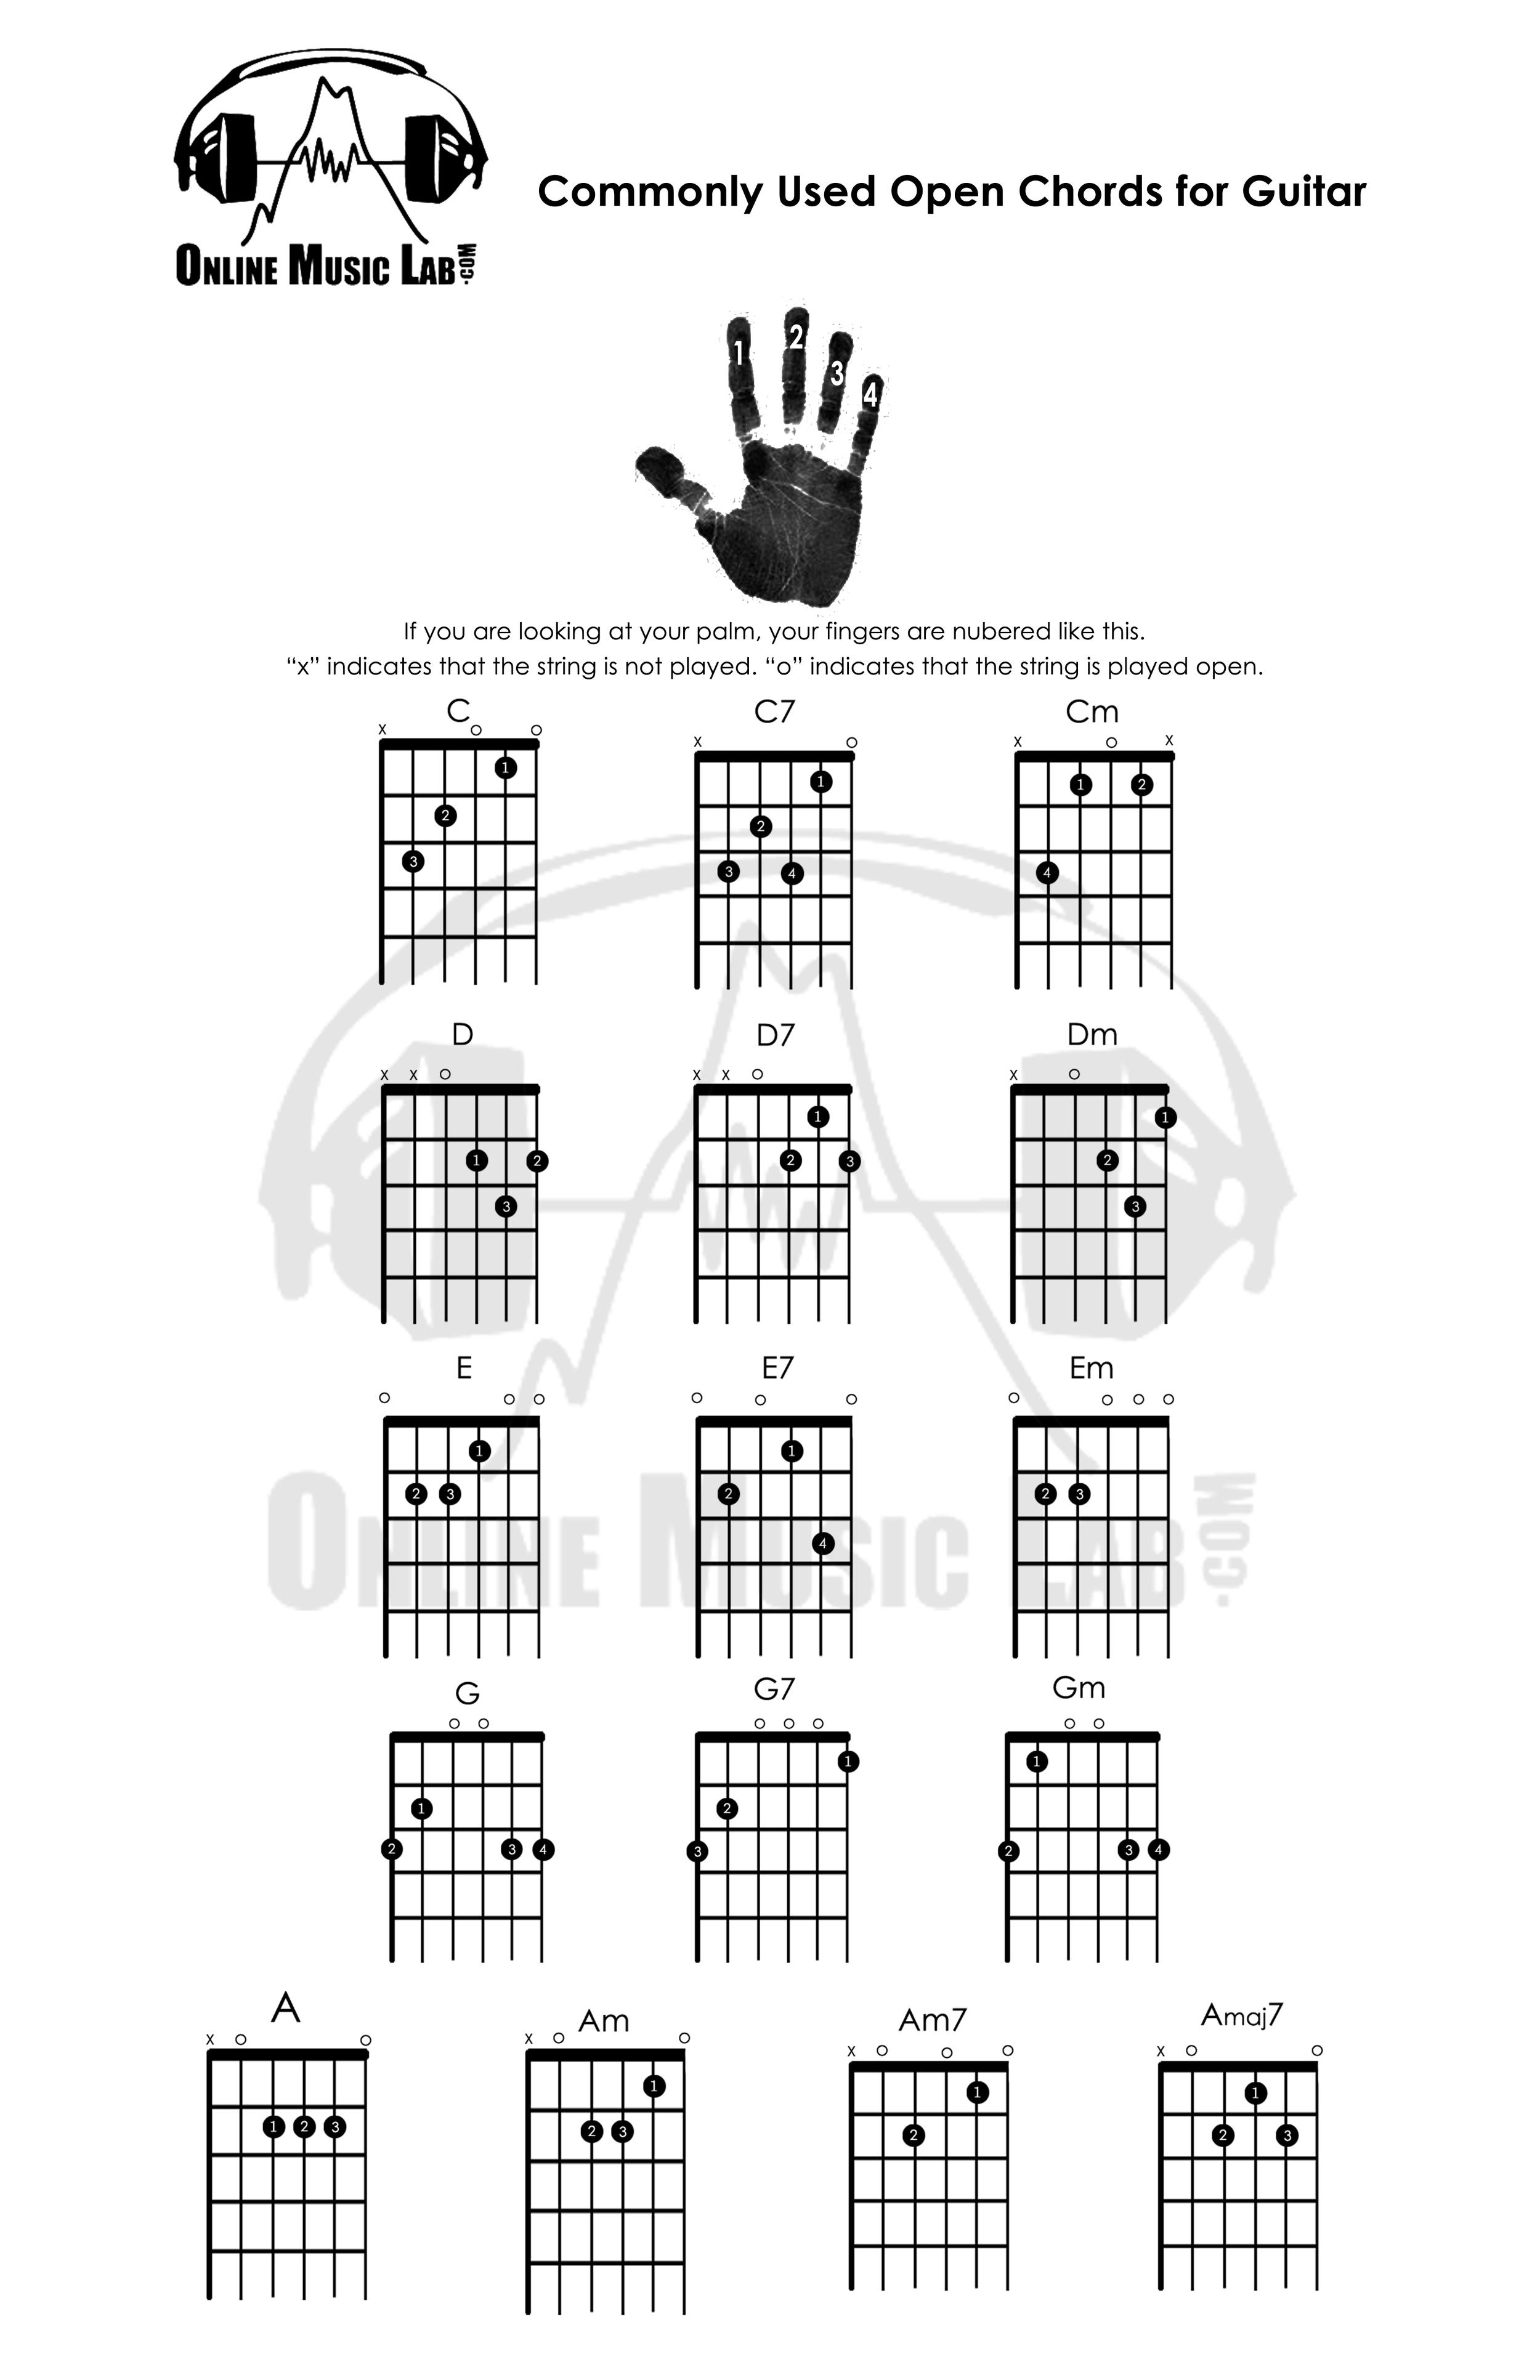 OML_Guitar Chord Chart.jpg